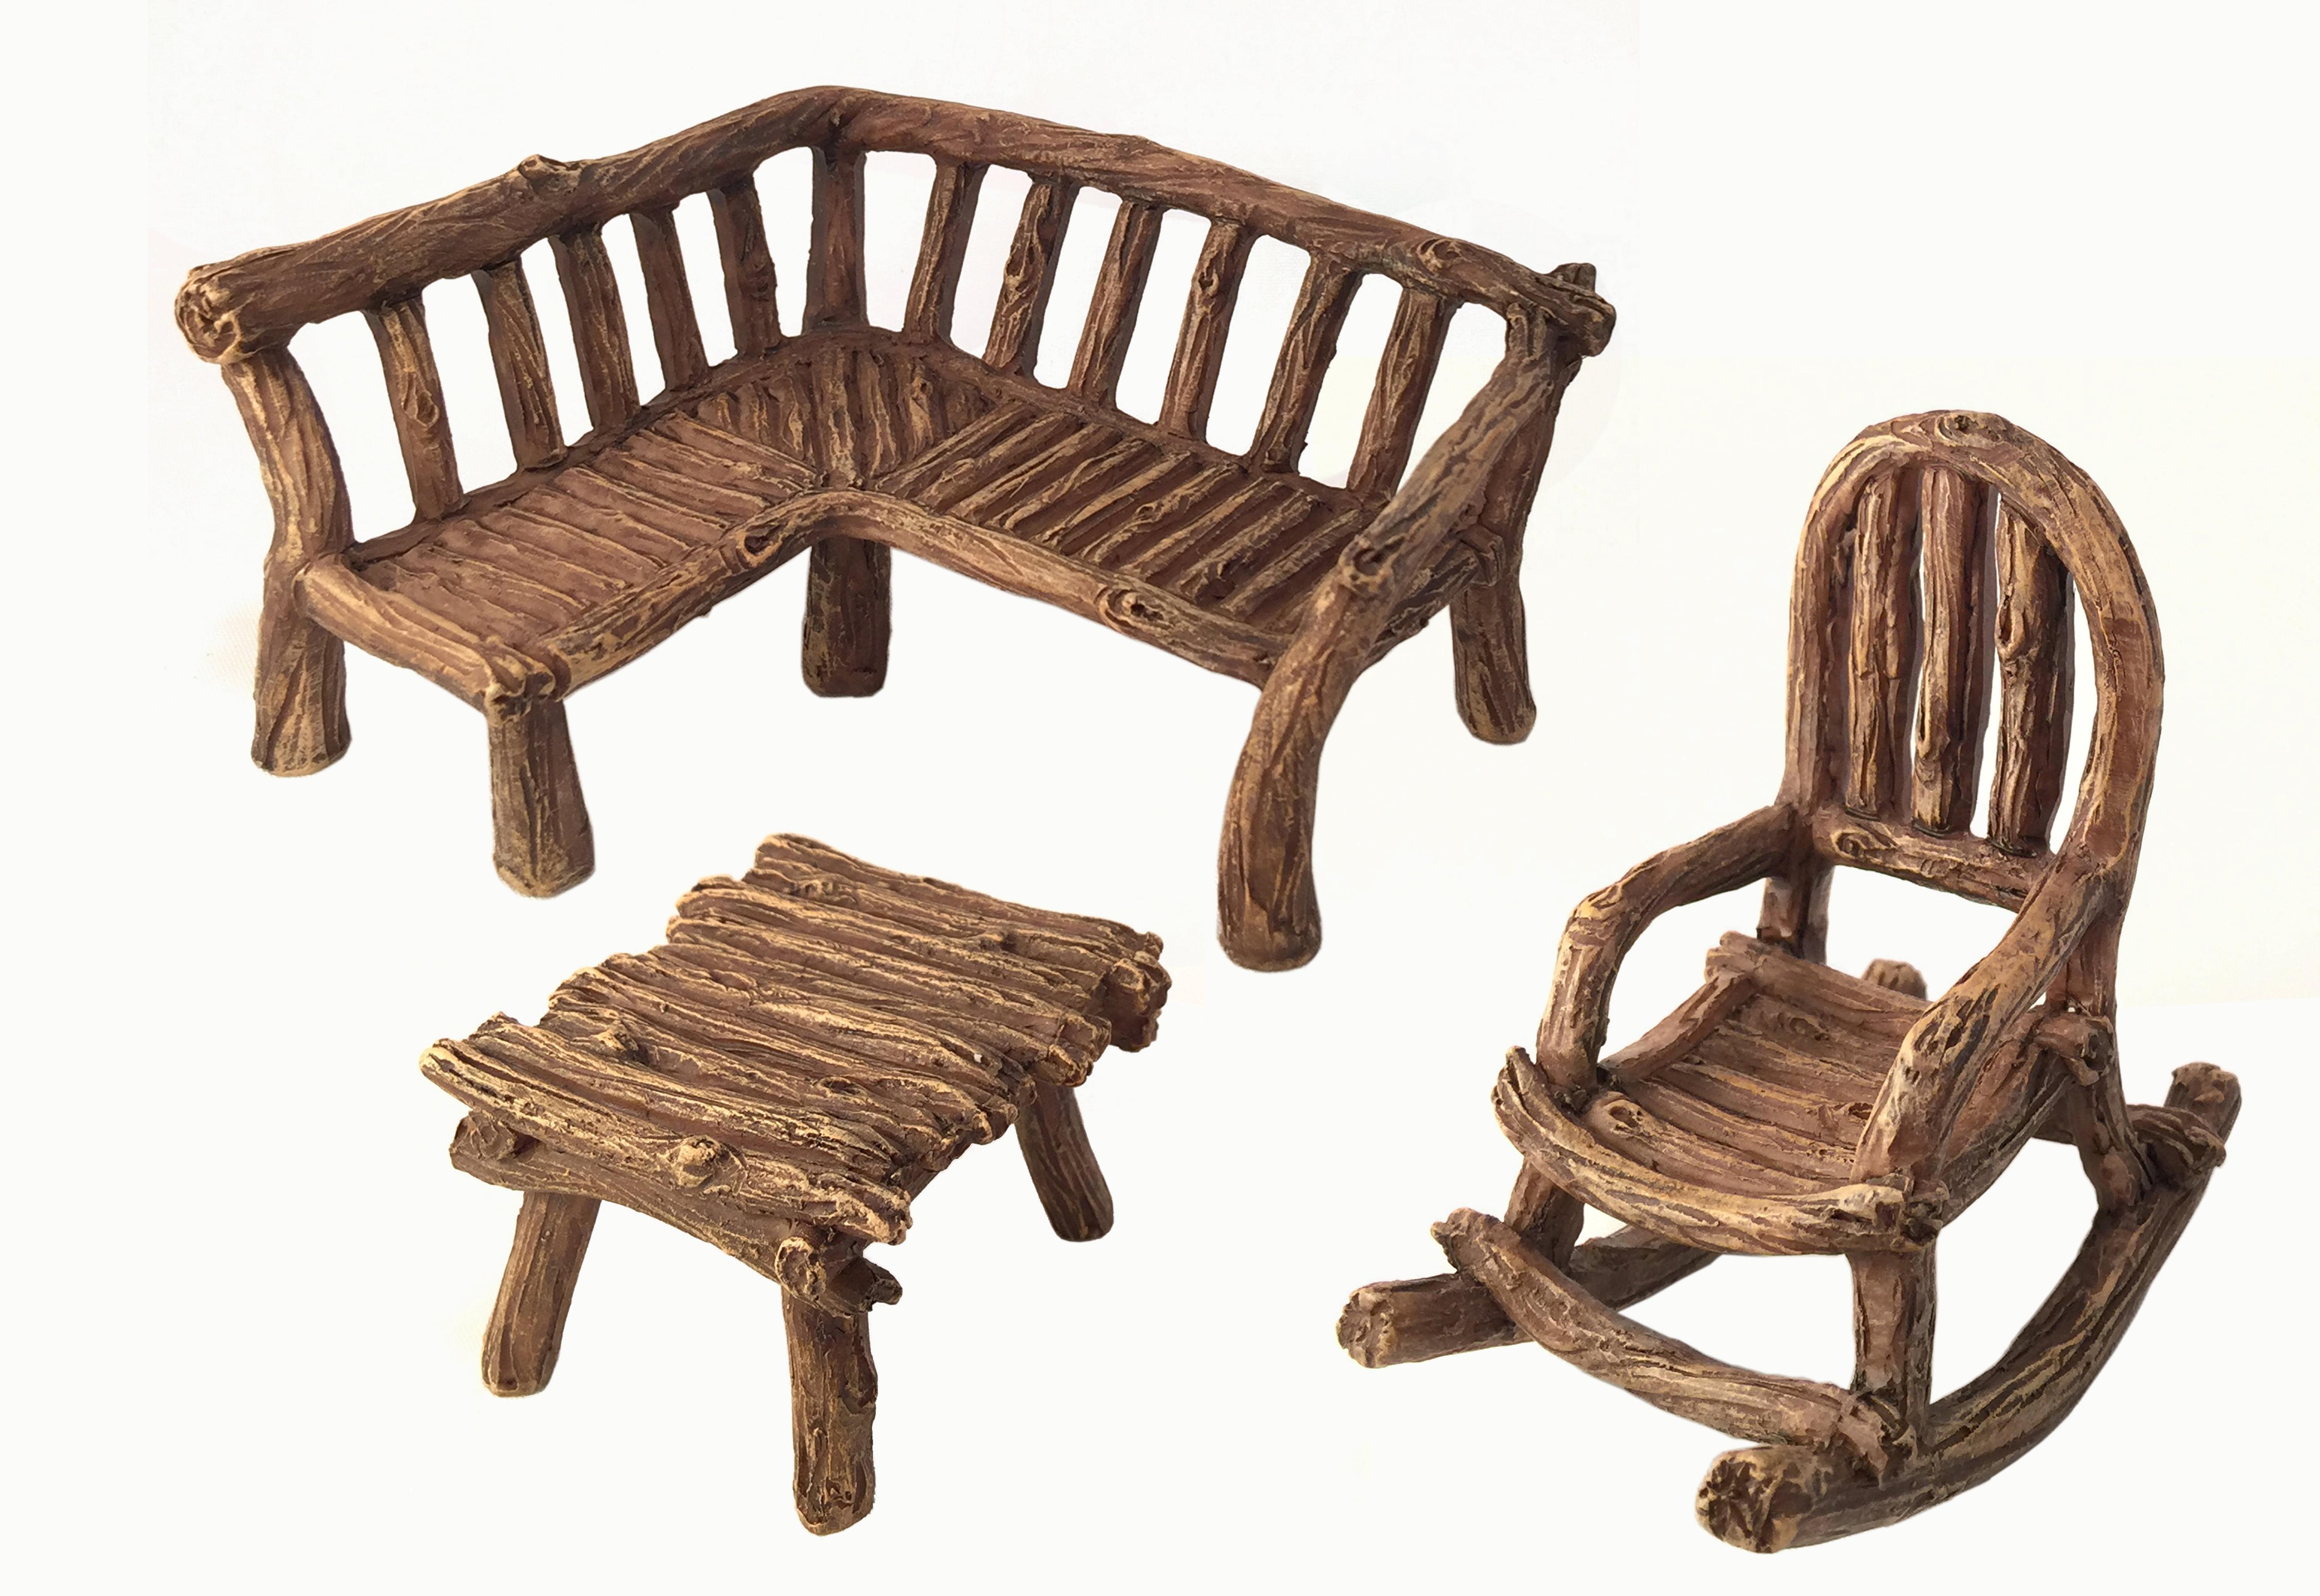 Miniature Fairy Garden Furniture 3Piece Rustic Wood Bench